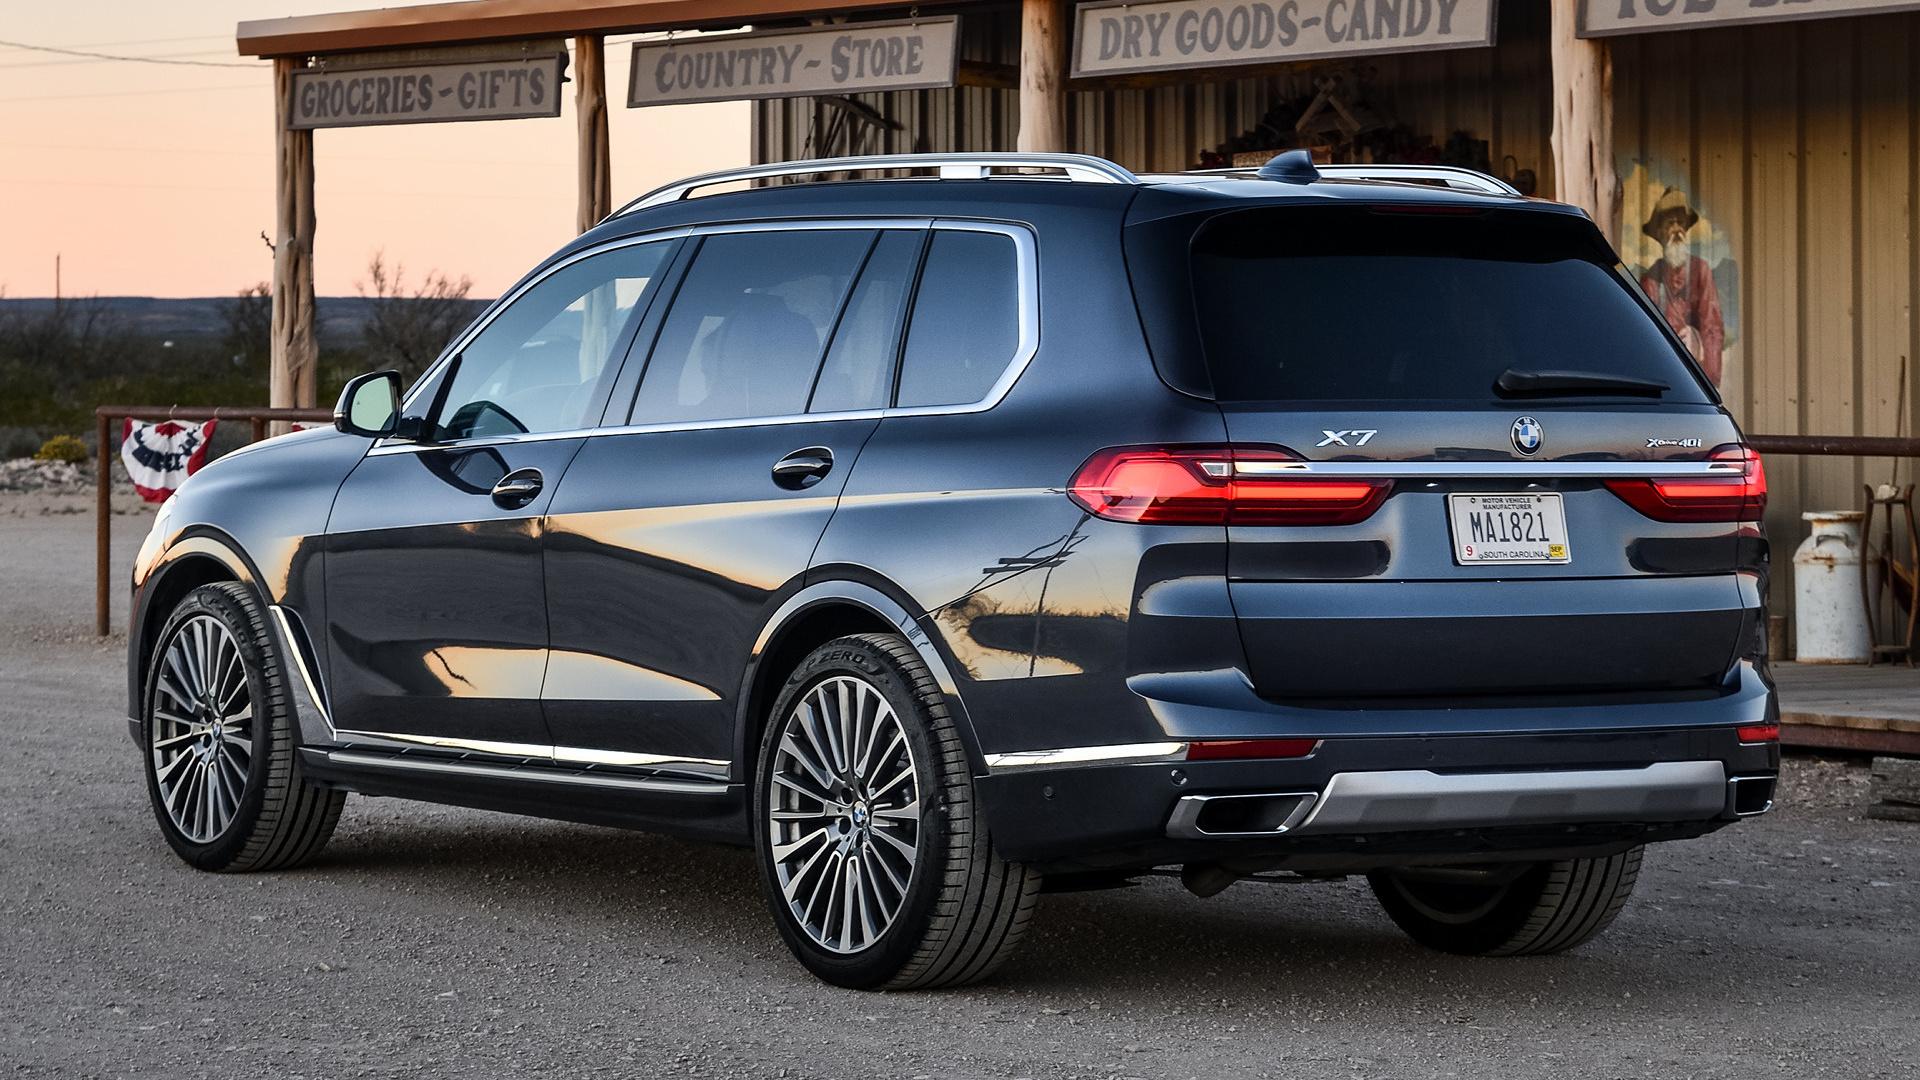 2020 BMW X7 (US) - Sfondi e Immagini HD per desktop | Car ...